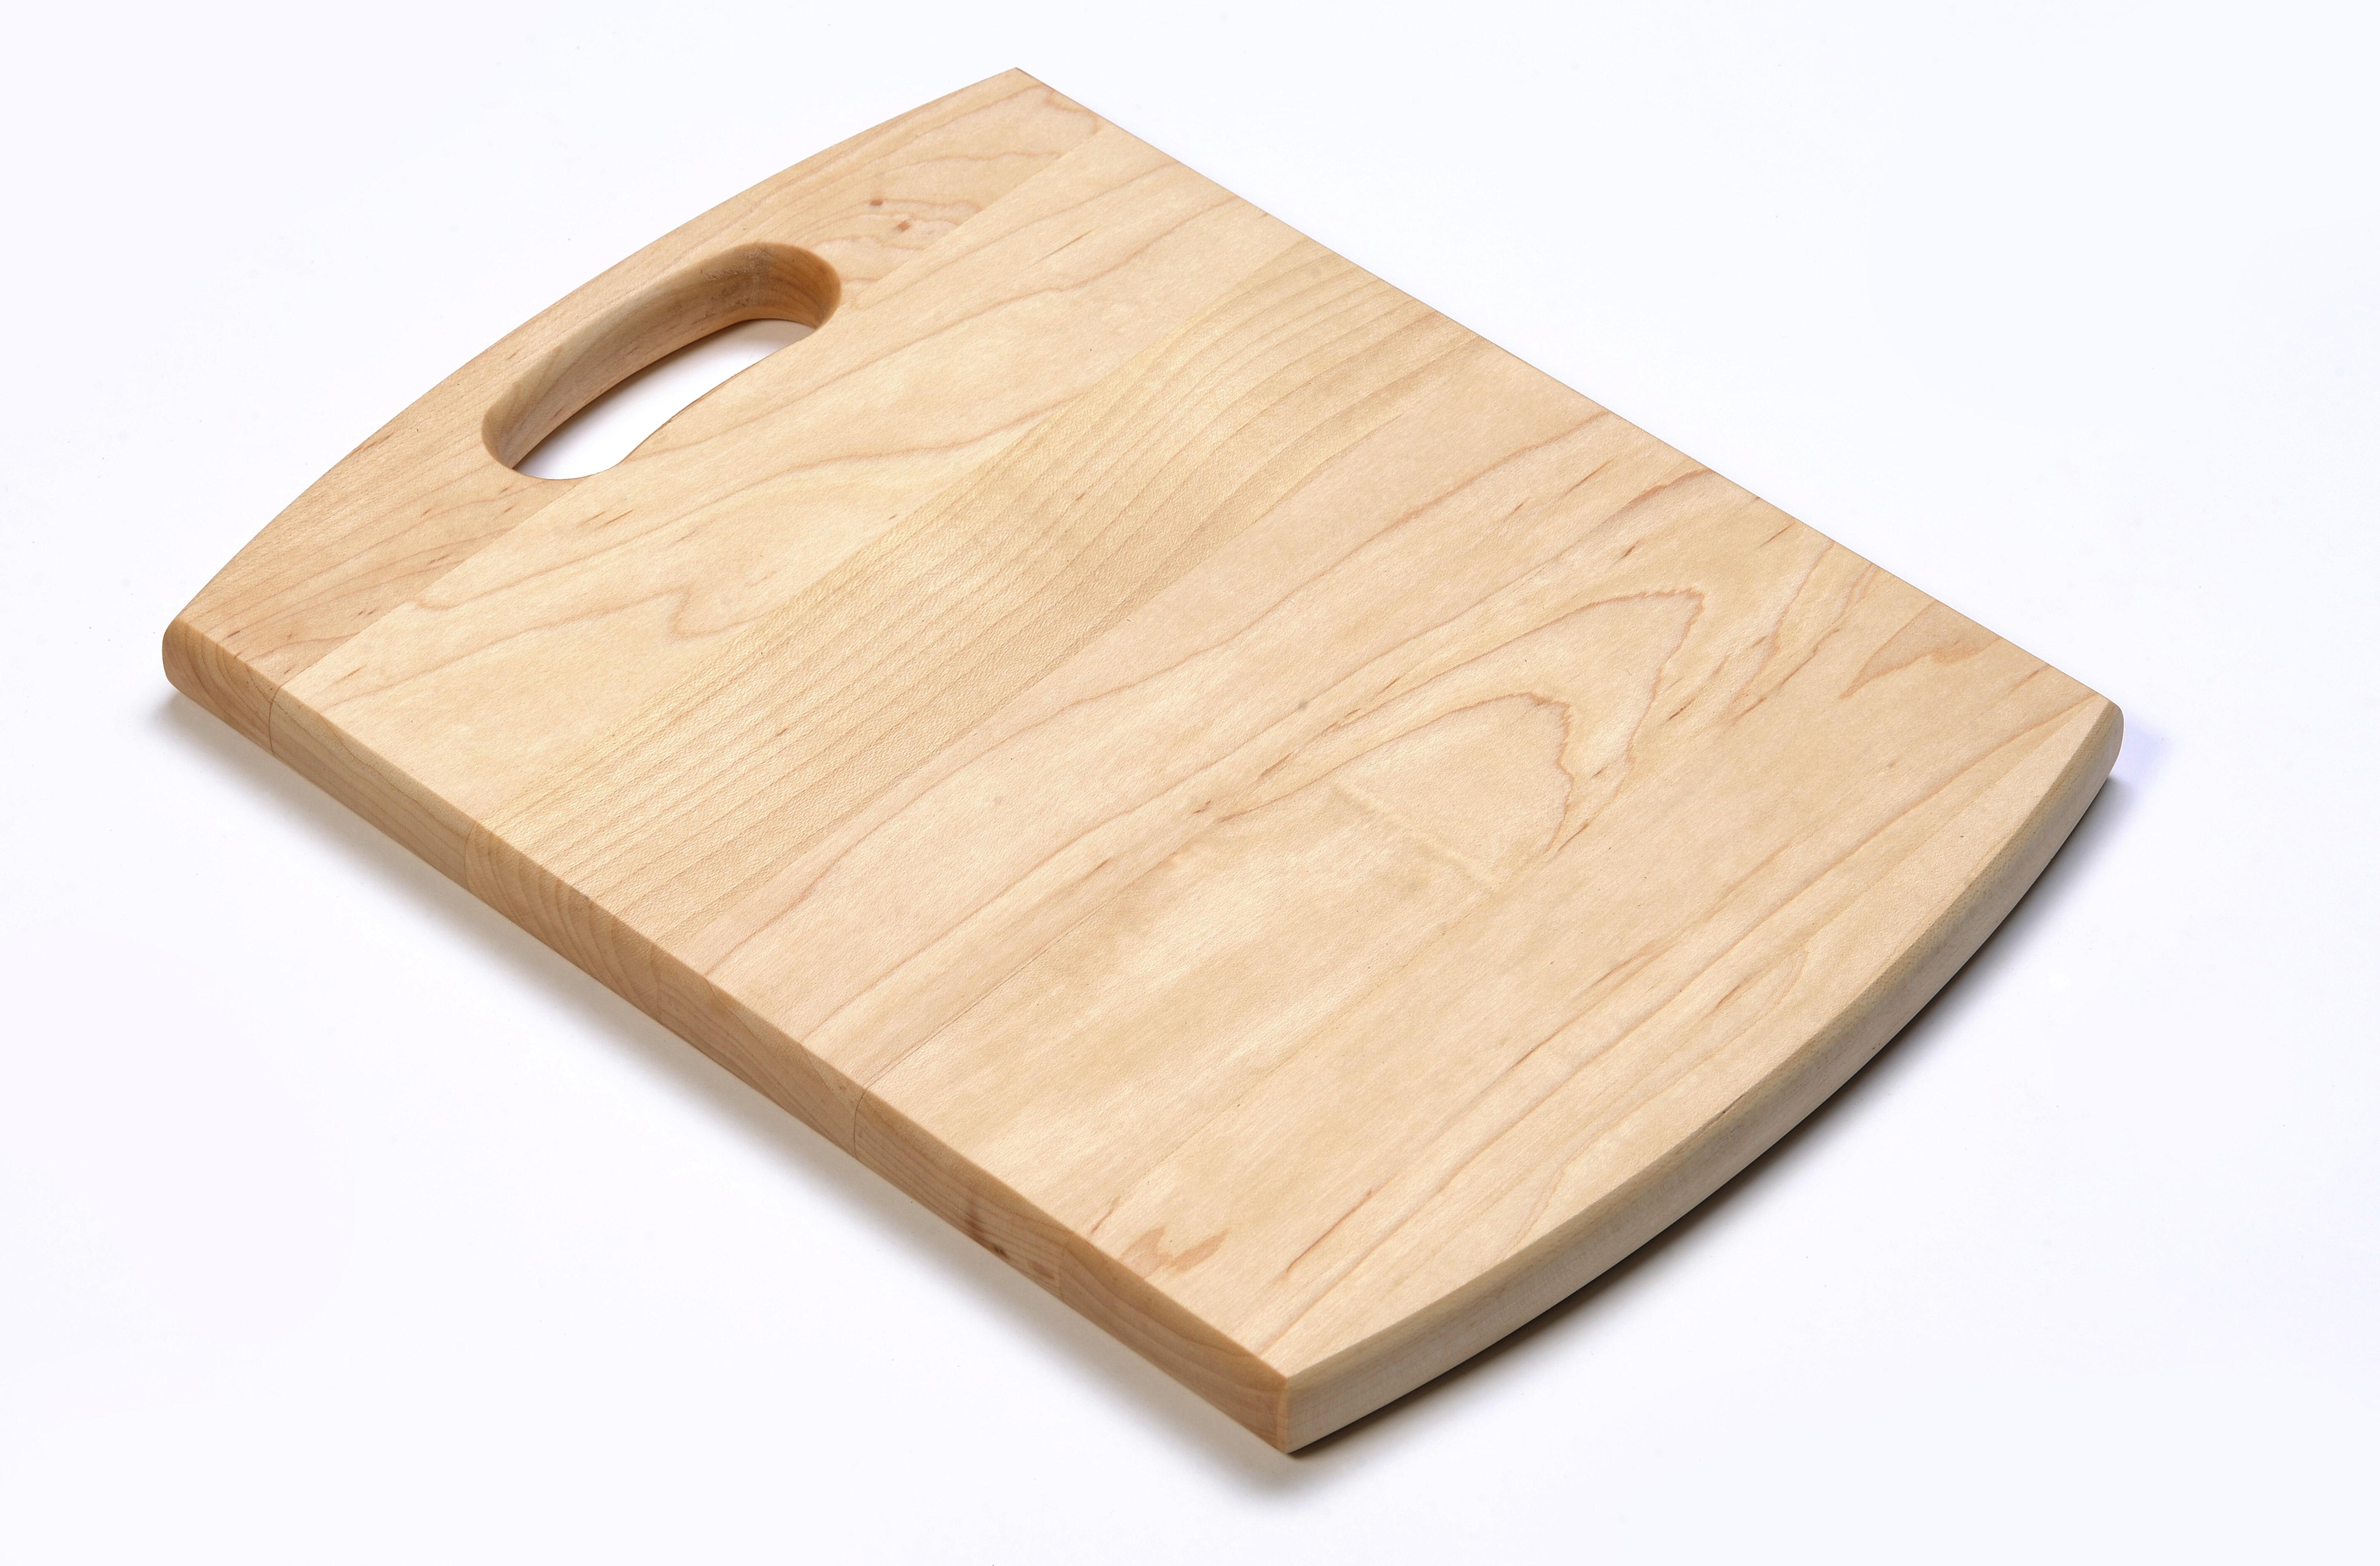 Warther Boards Maple Wood Cutting Board Wayfair